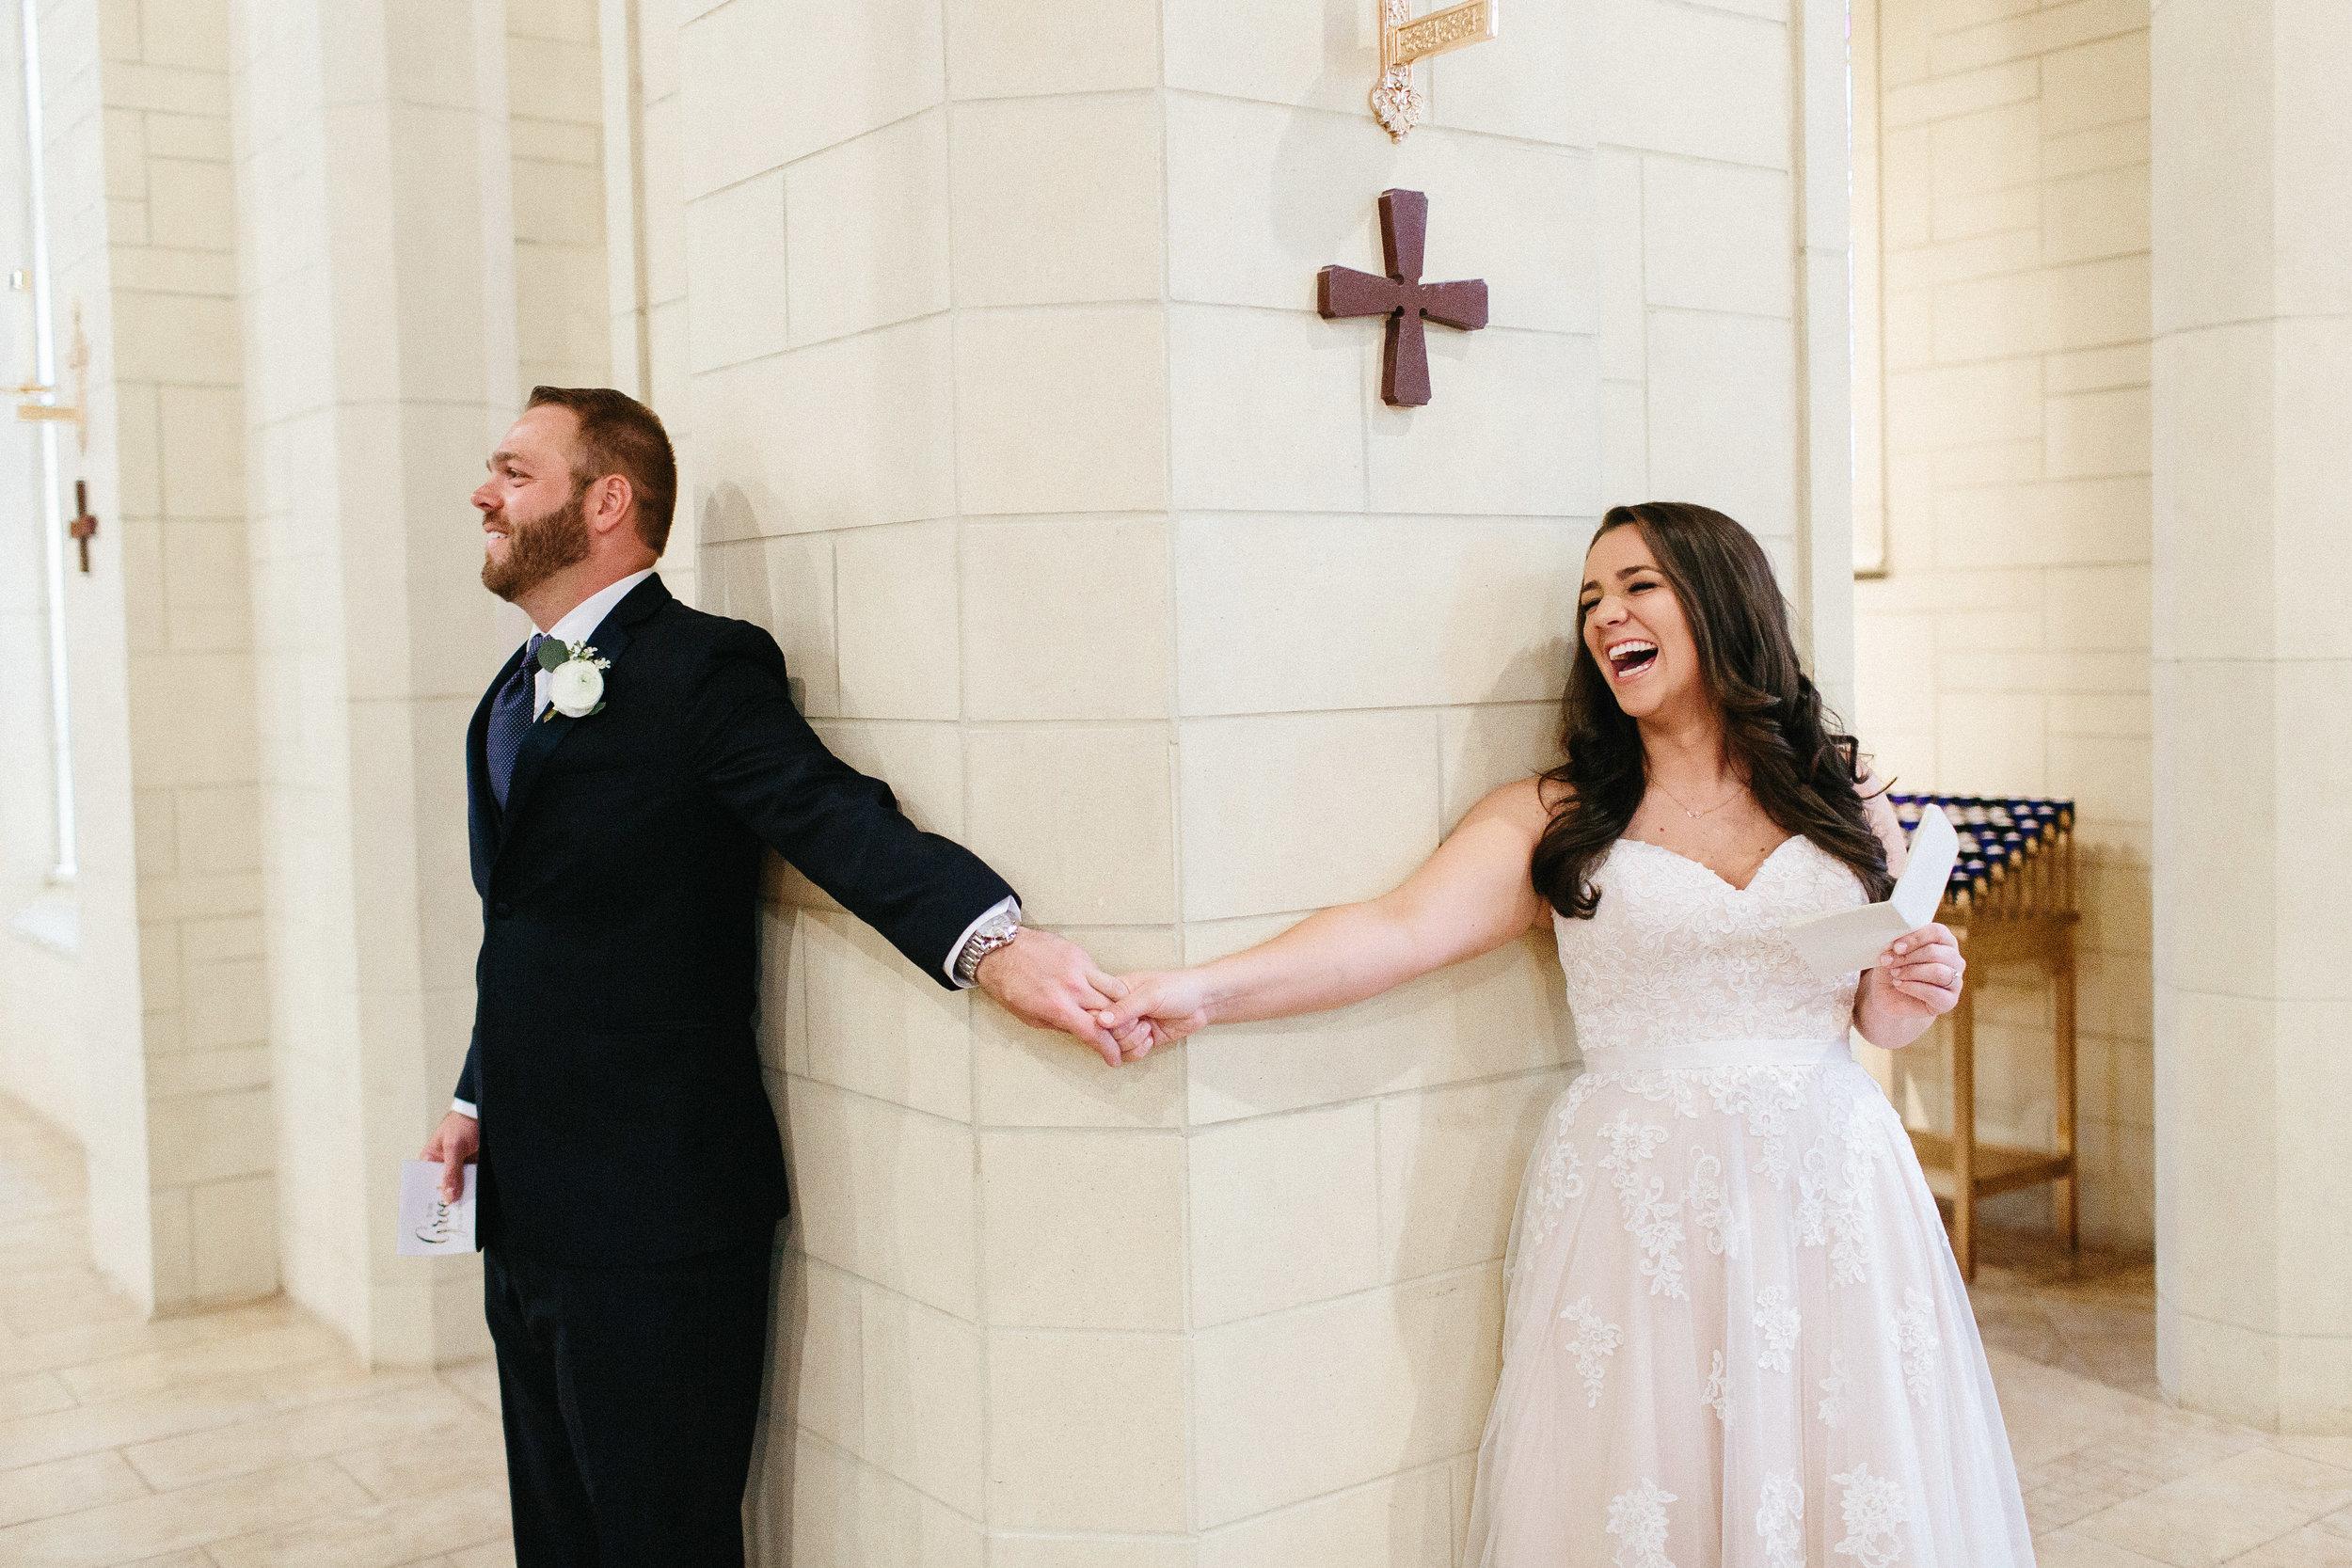 roswell_st_peter_chanel_catholic_avalon_hotel_alpharetta_wedding-1218.jpg